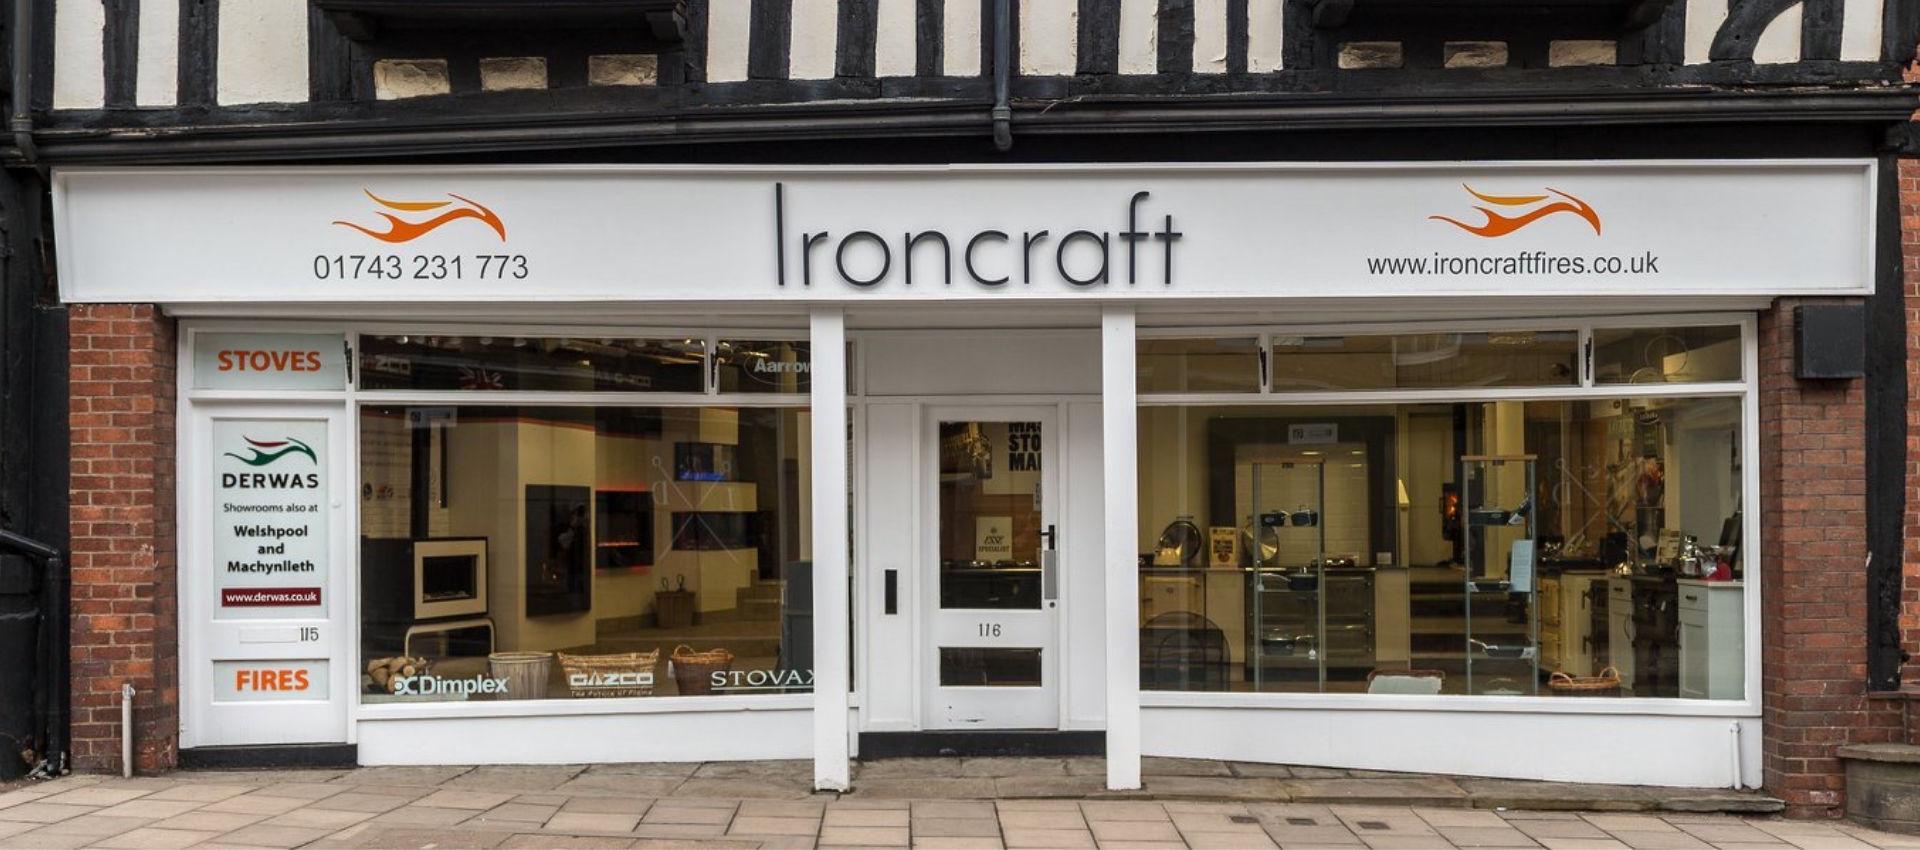 Ironcraft Fires & Stoves Ltd